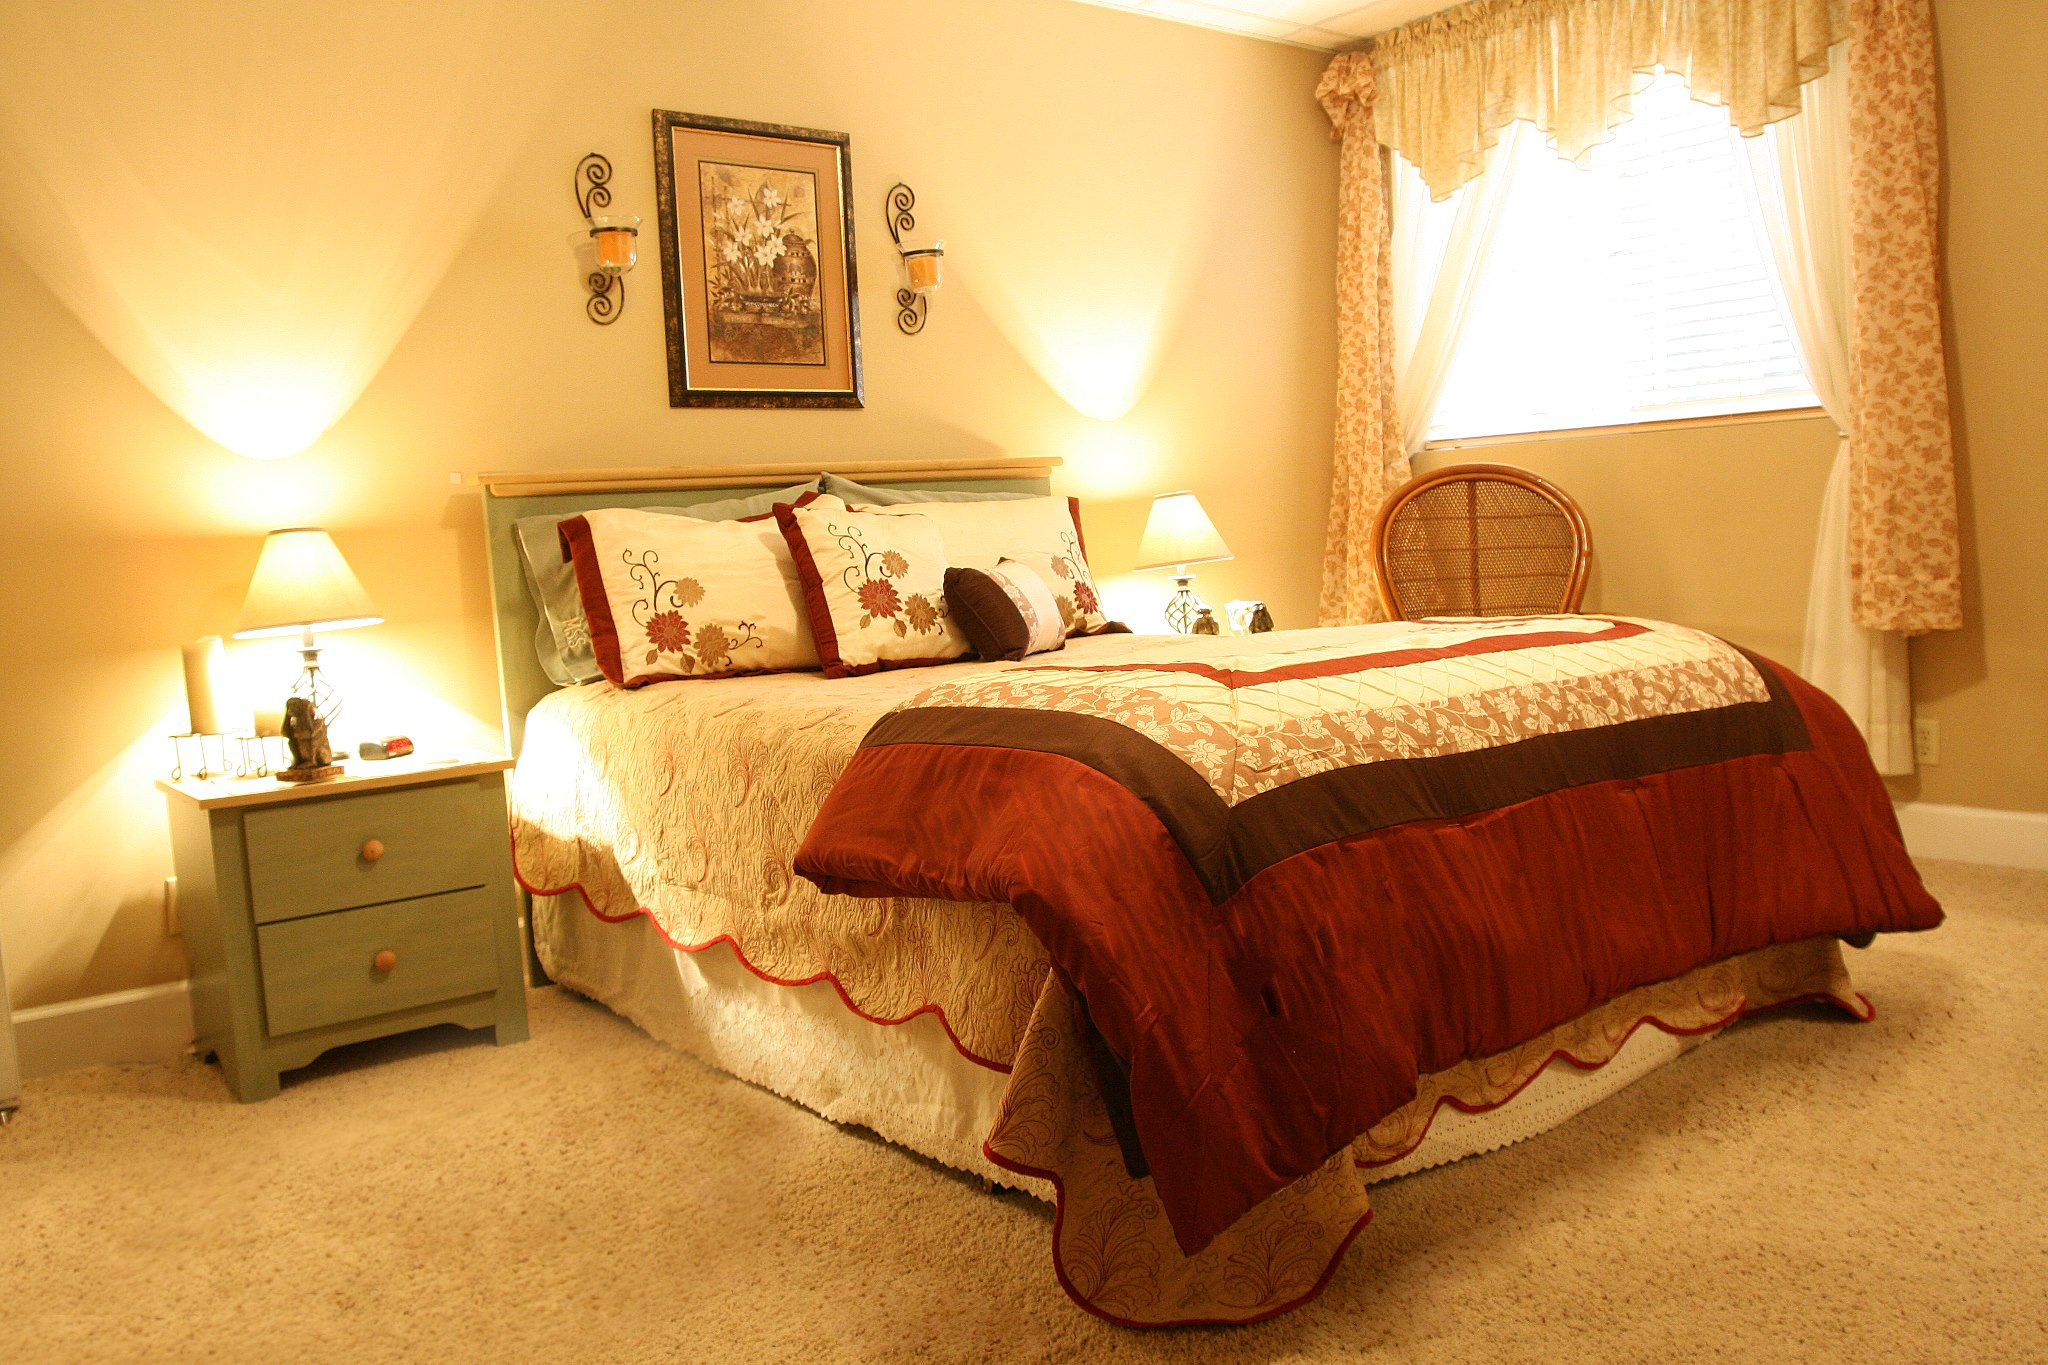 Monroe Street Suites, Pittsfield IL